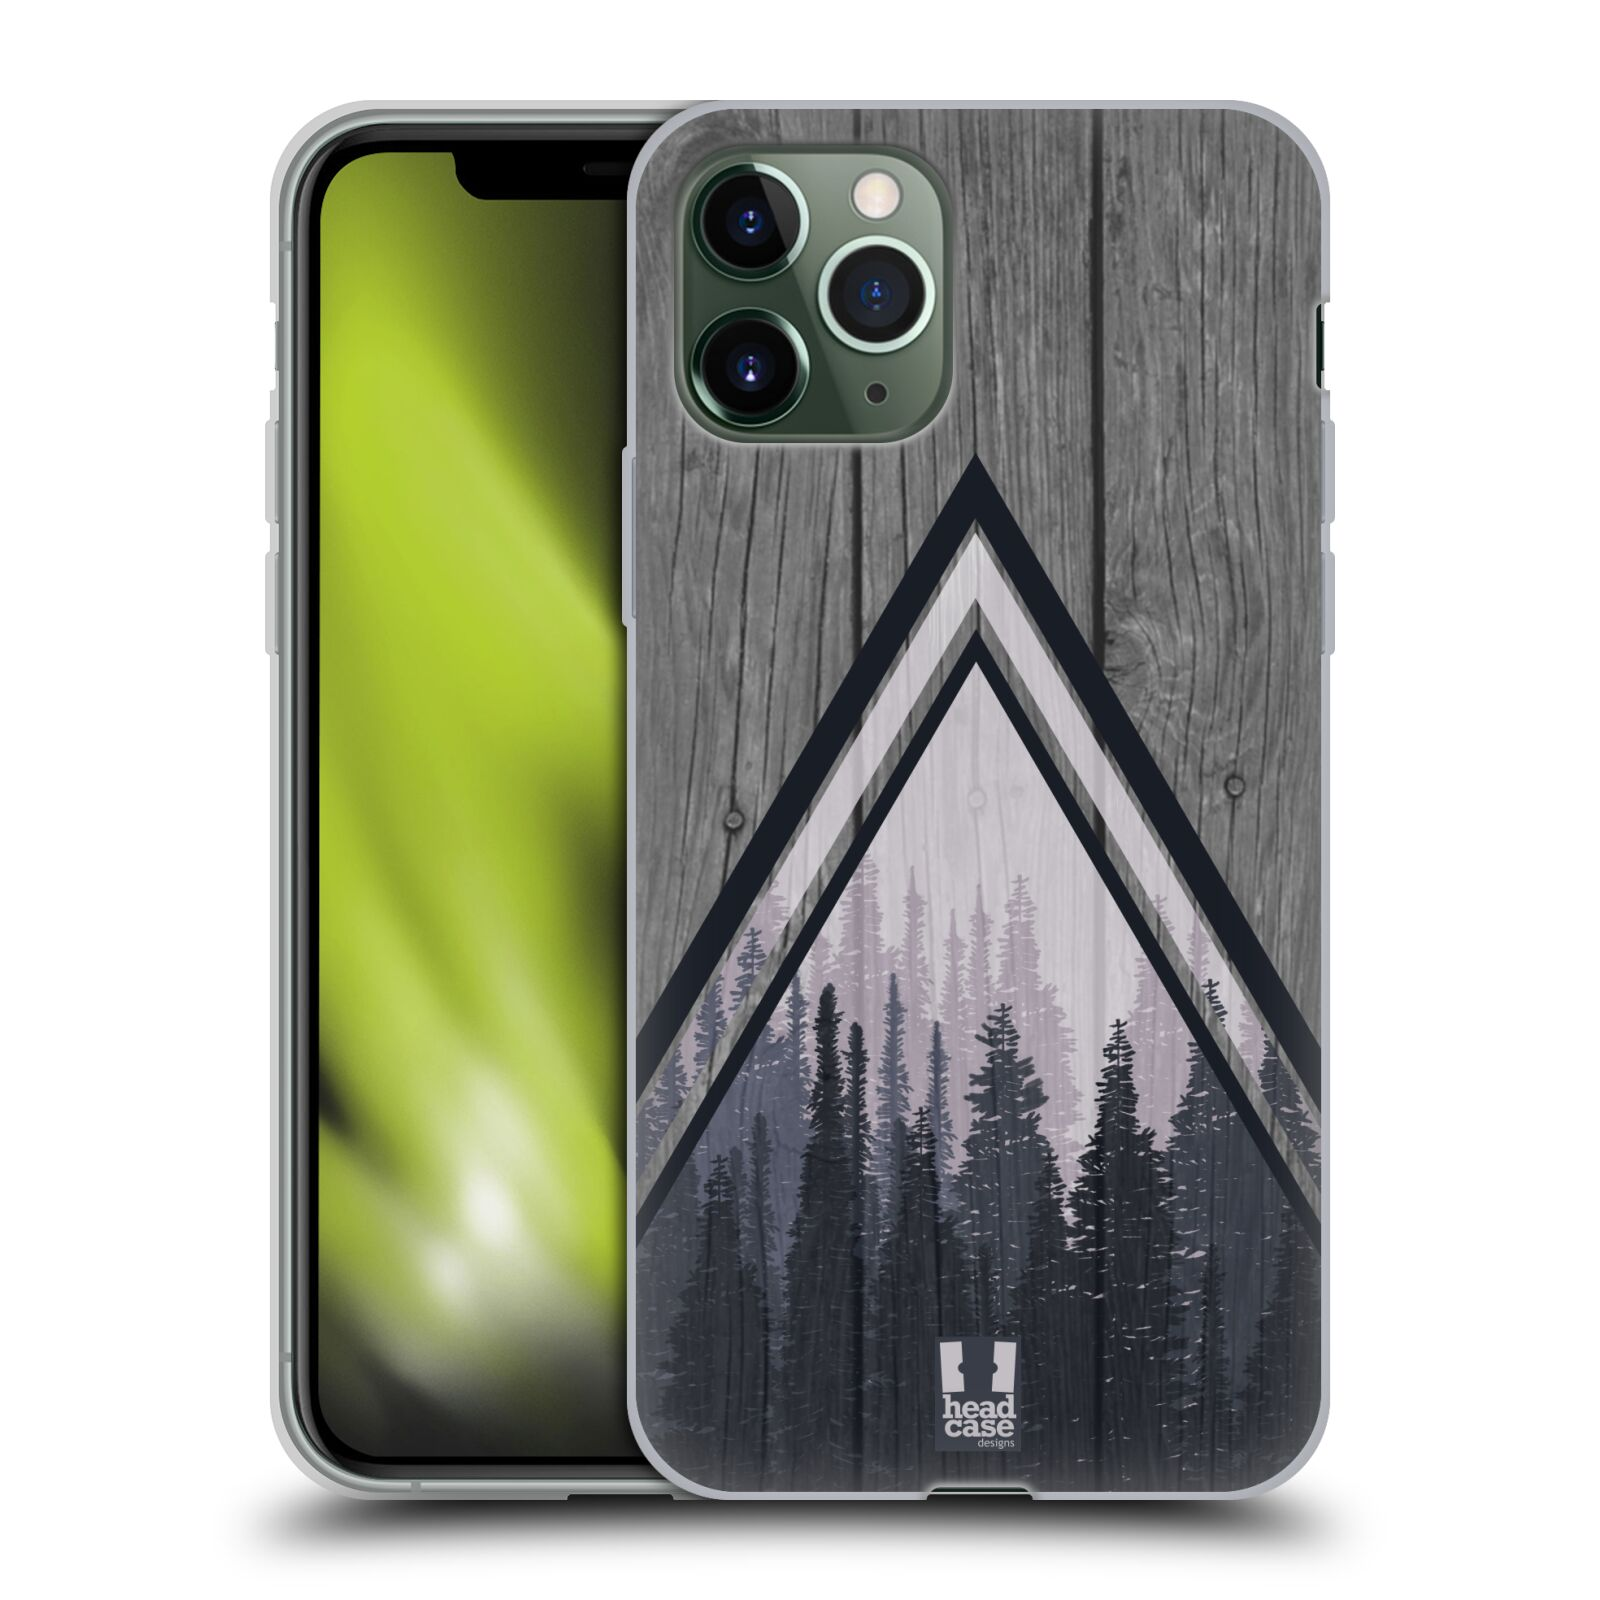 Silikonové pouzdro na mobil Apple iPhone 11 Pro - Head Case - Dřevo a temný les